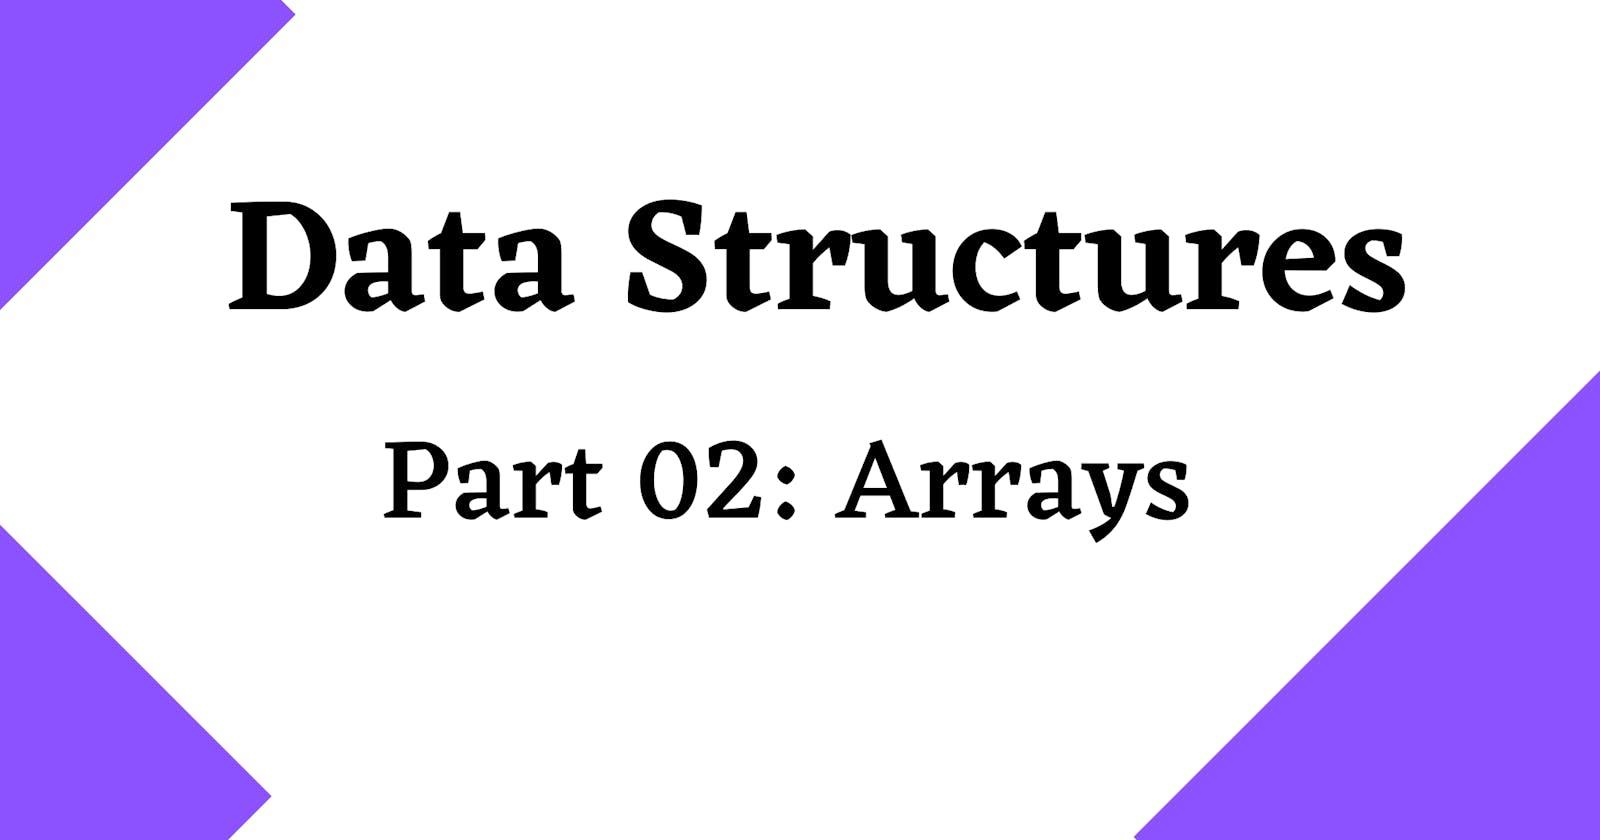 Data Structures 101: Arrays 🚀